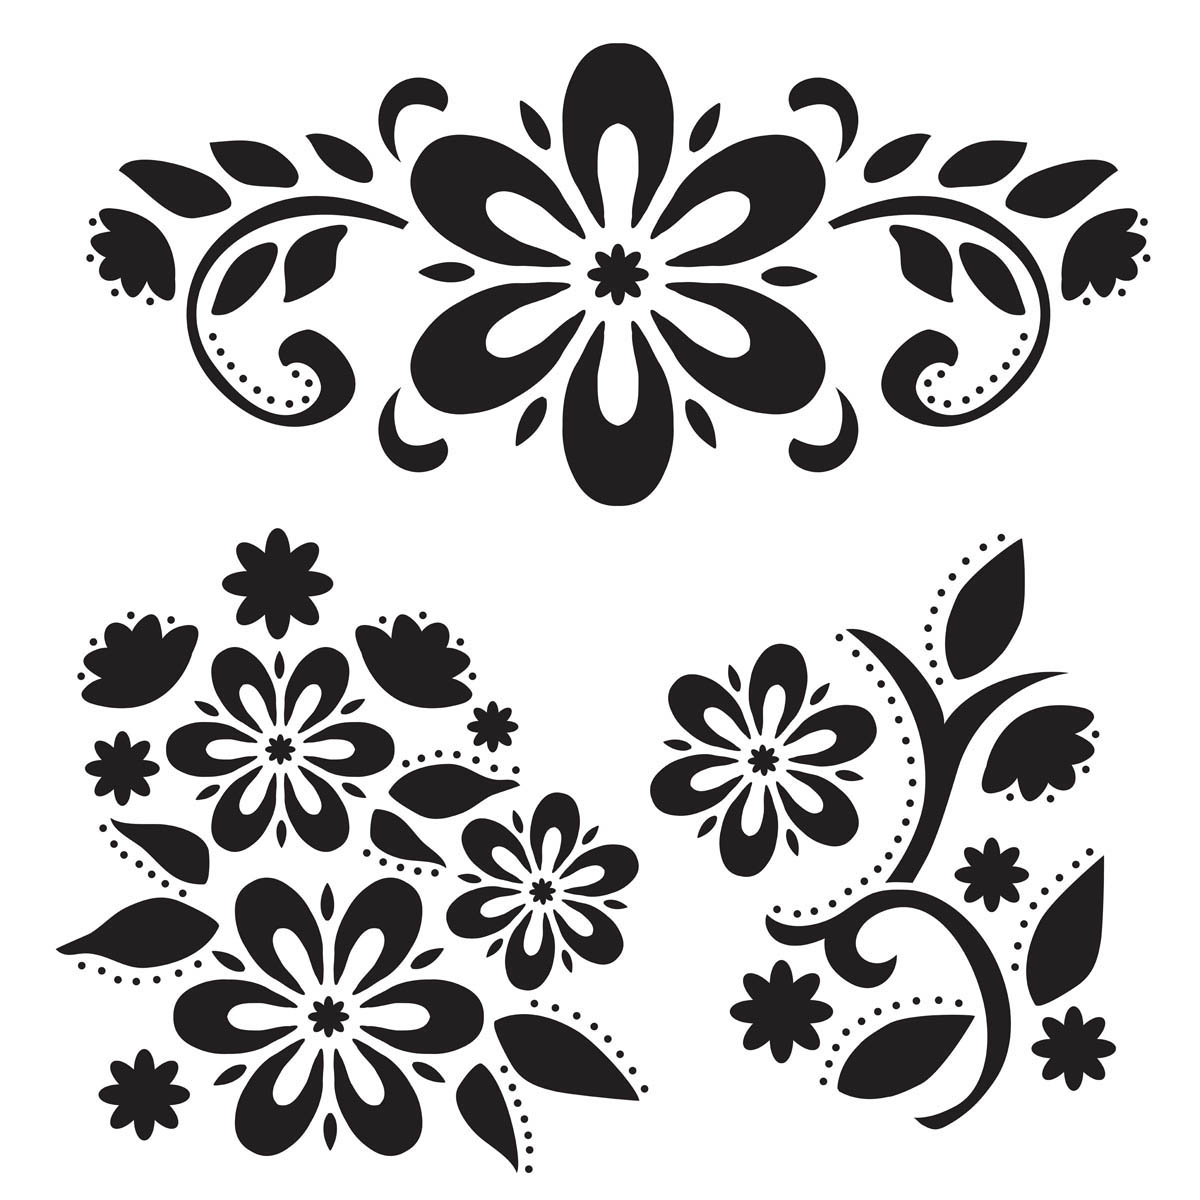 FolkArt ® Painting Stencils - Large - Debbie's Floral